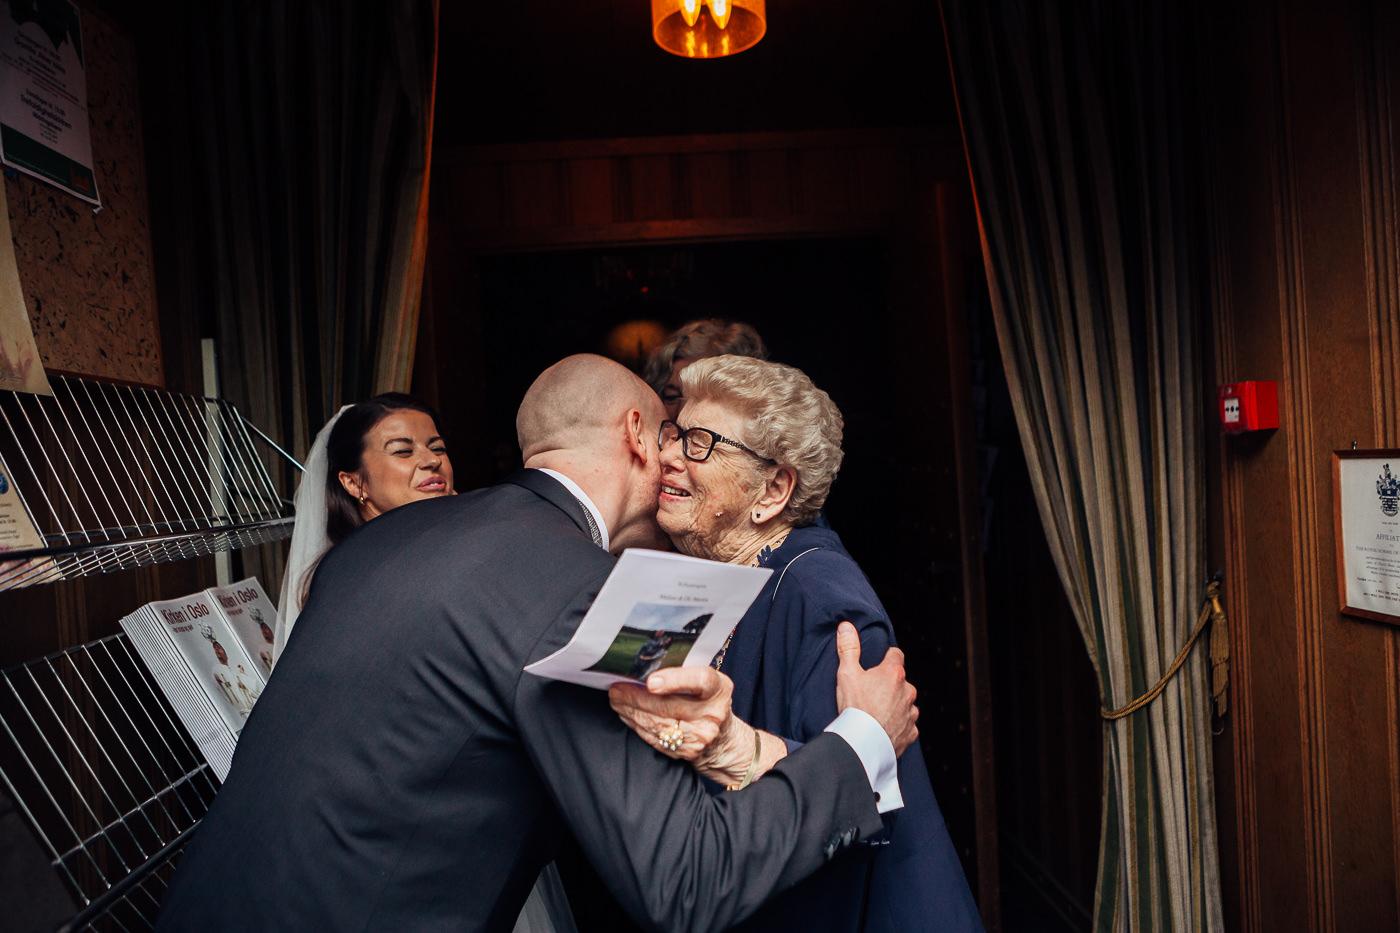 Malene & Ole Martin - elegant dansk- norskt bryllup i Oslo Bryllup Gamle Aker Oslo 47 Akershus